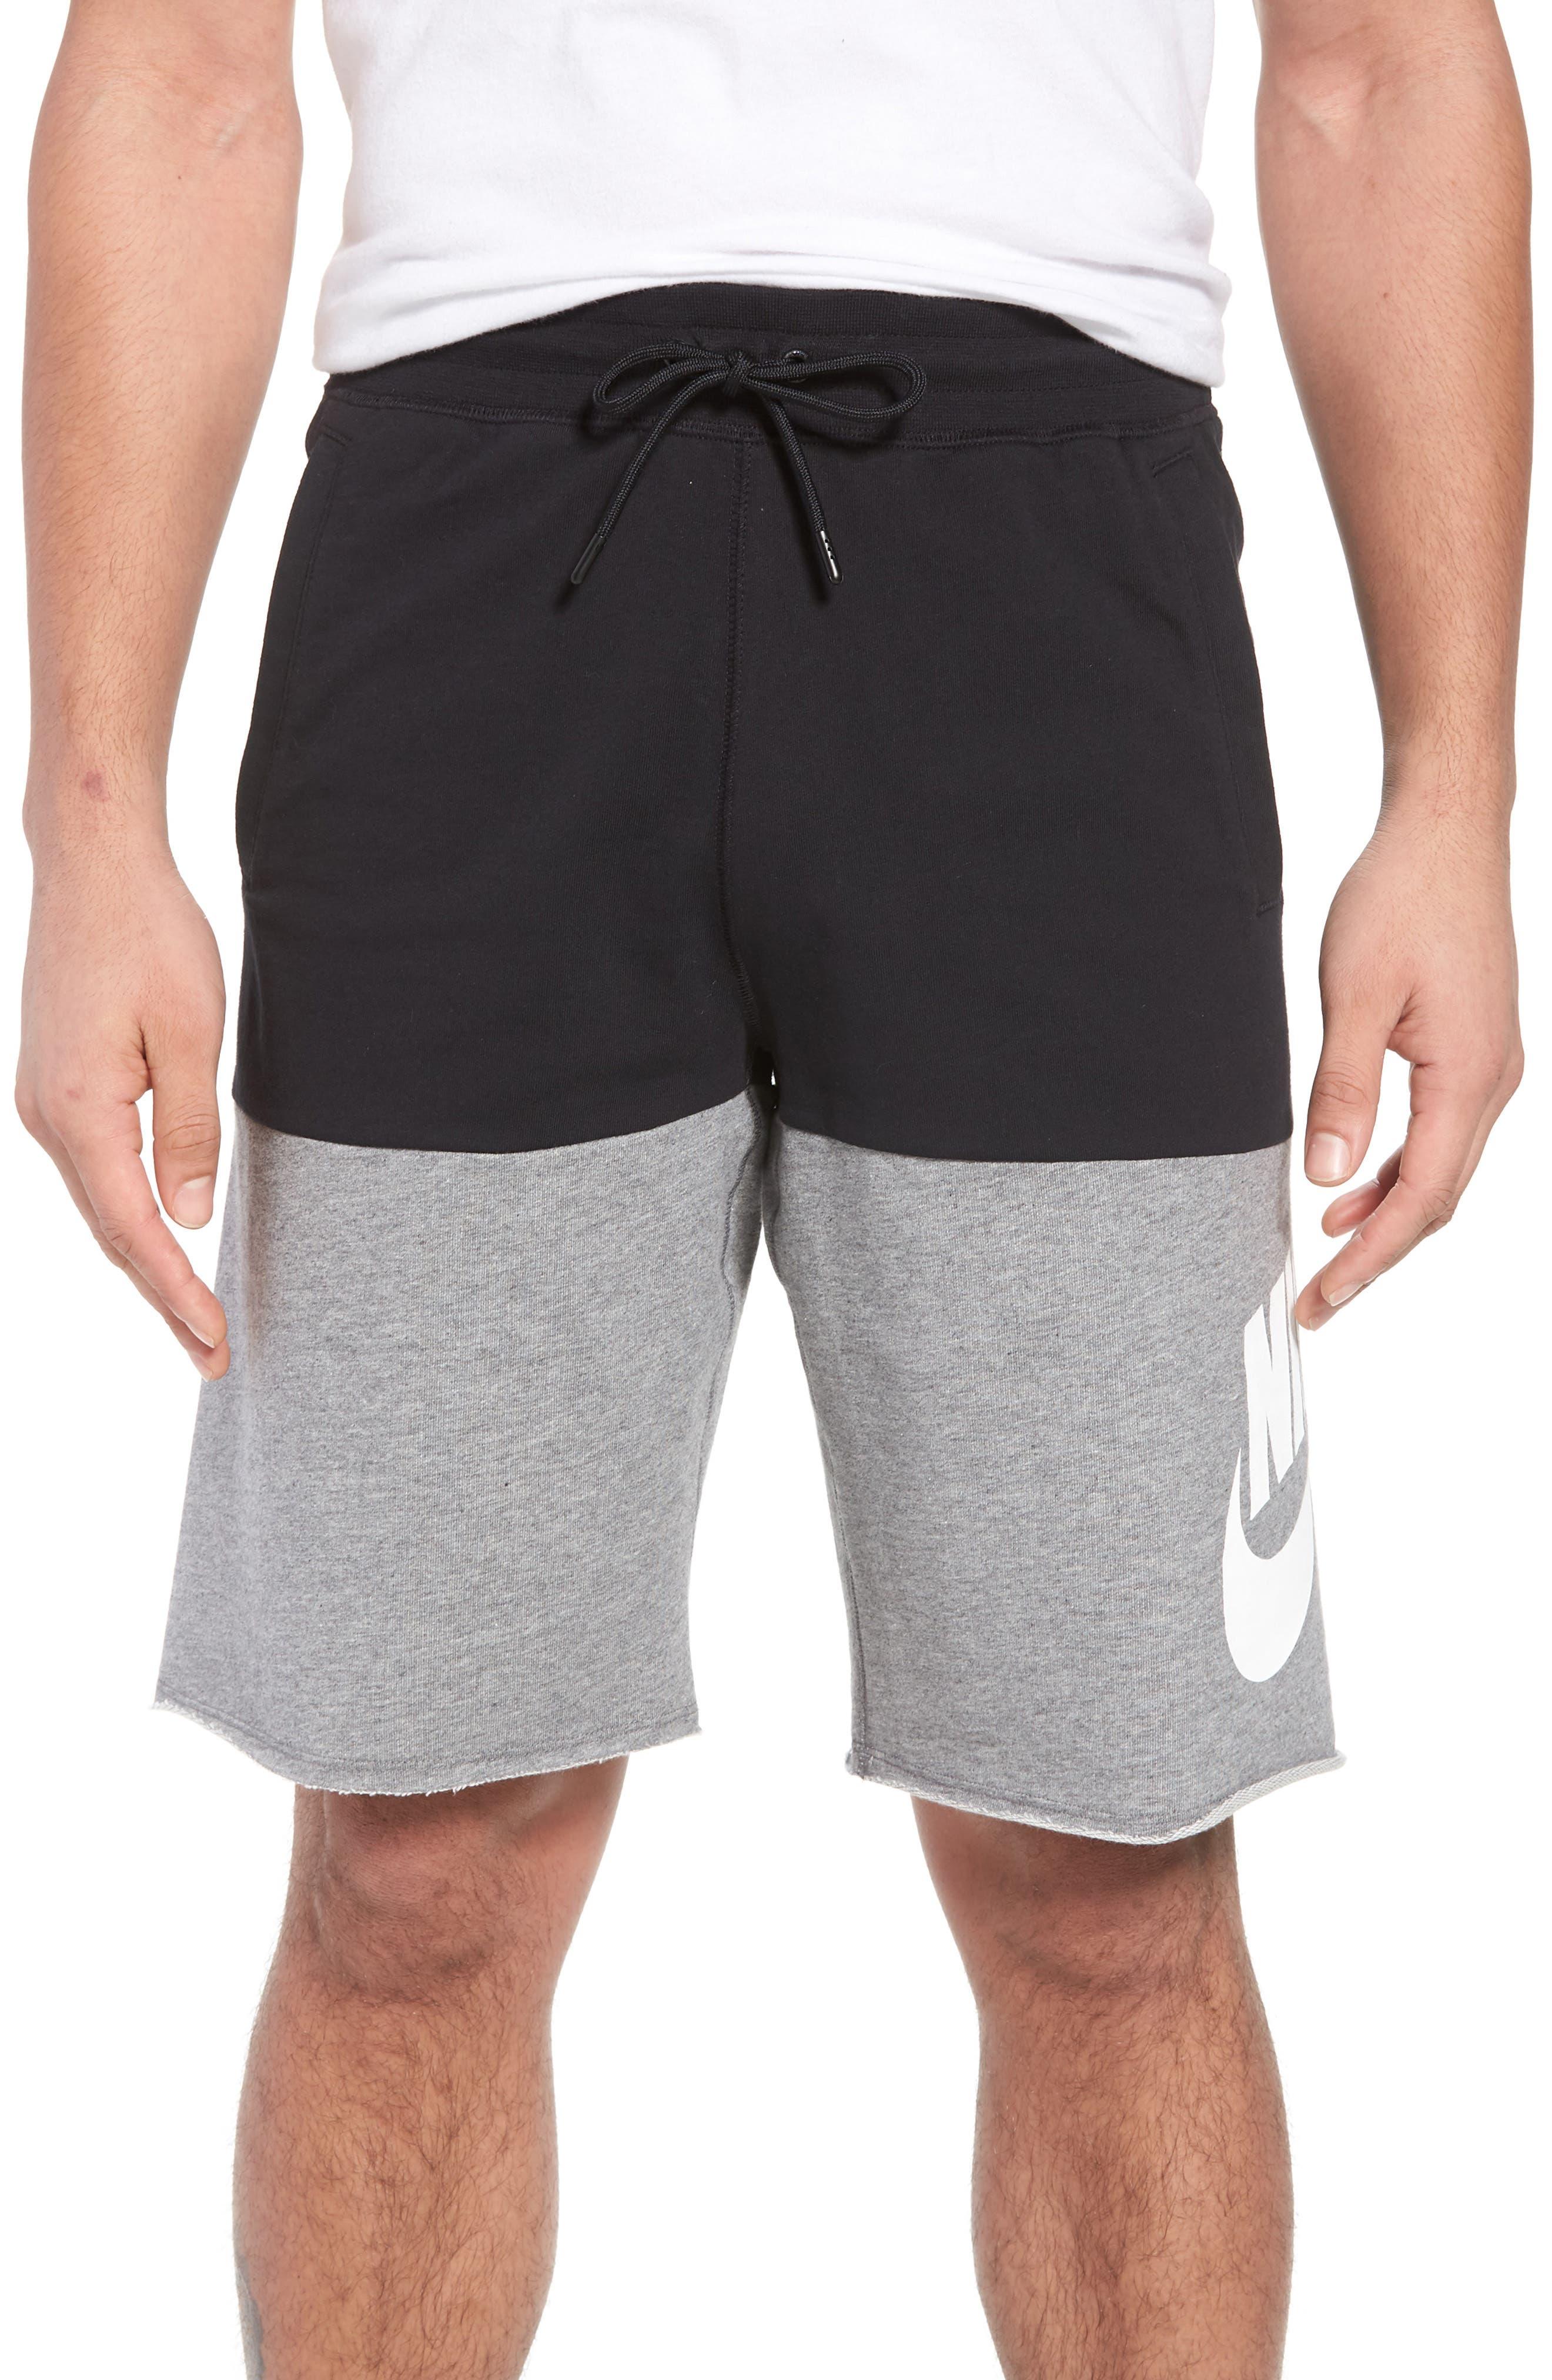 NSW Franchise GX3 Shorts,                         Main,                         color, BLACK/ CARBON HEATHER/ WHITE